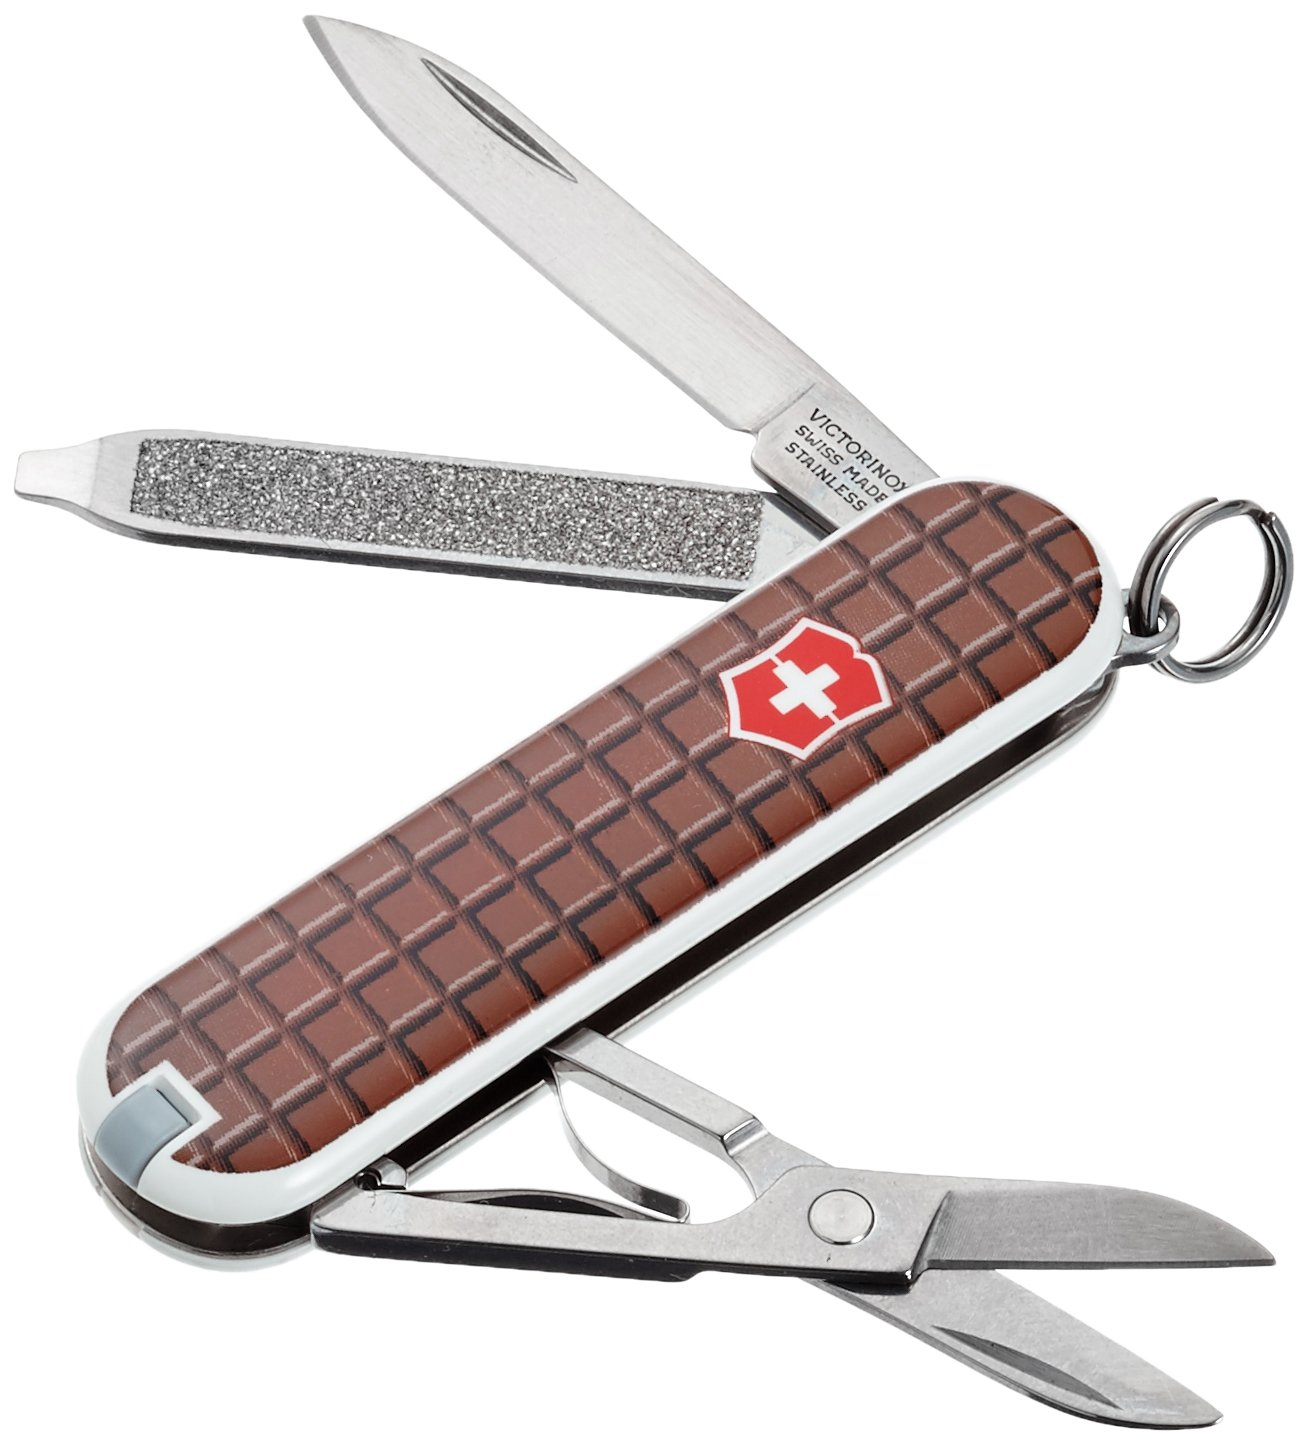 Victorinox V06223.842 Navaja Pequeña Classic Sd, Chocolate, Marrón, S 0.6223.842